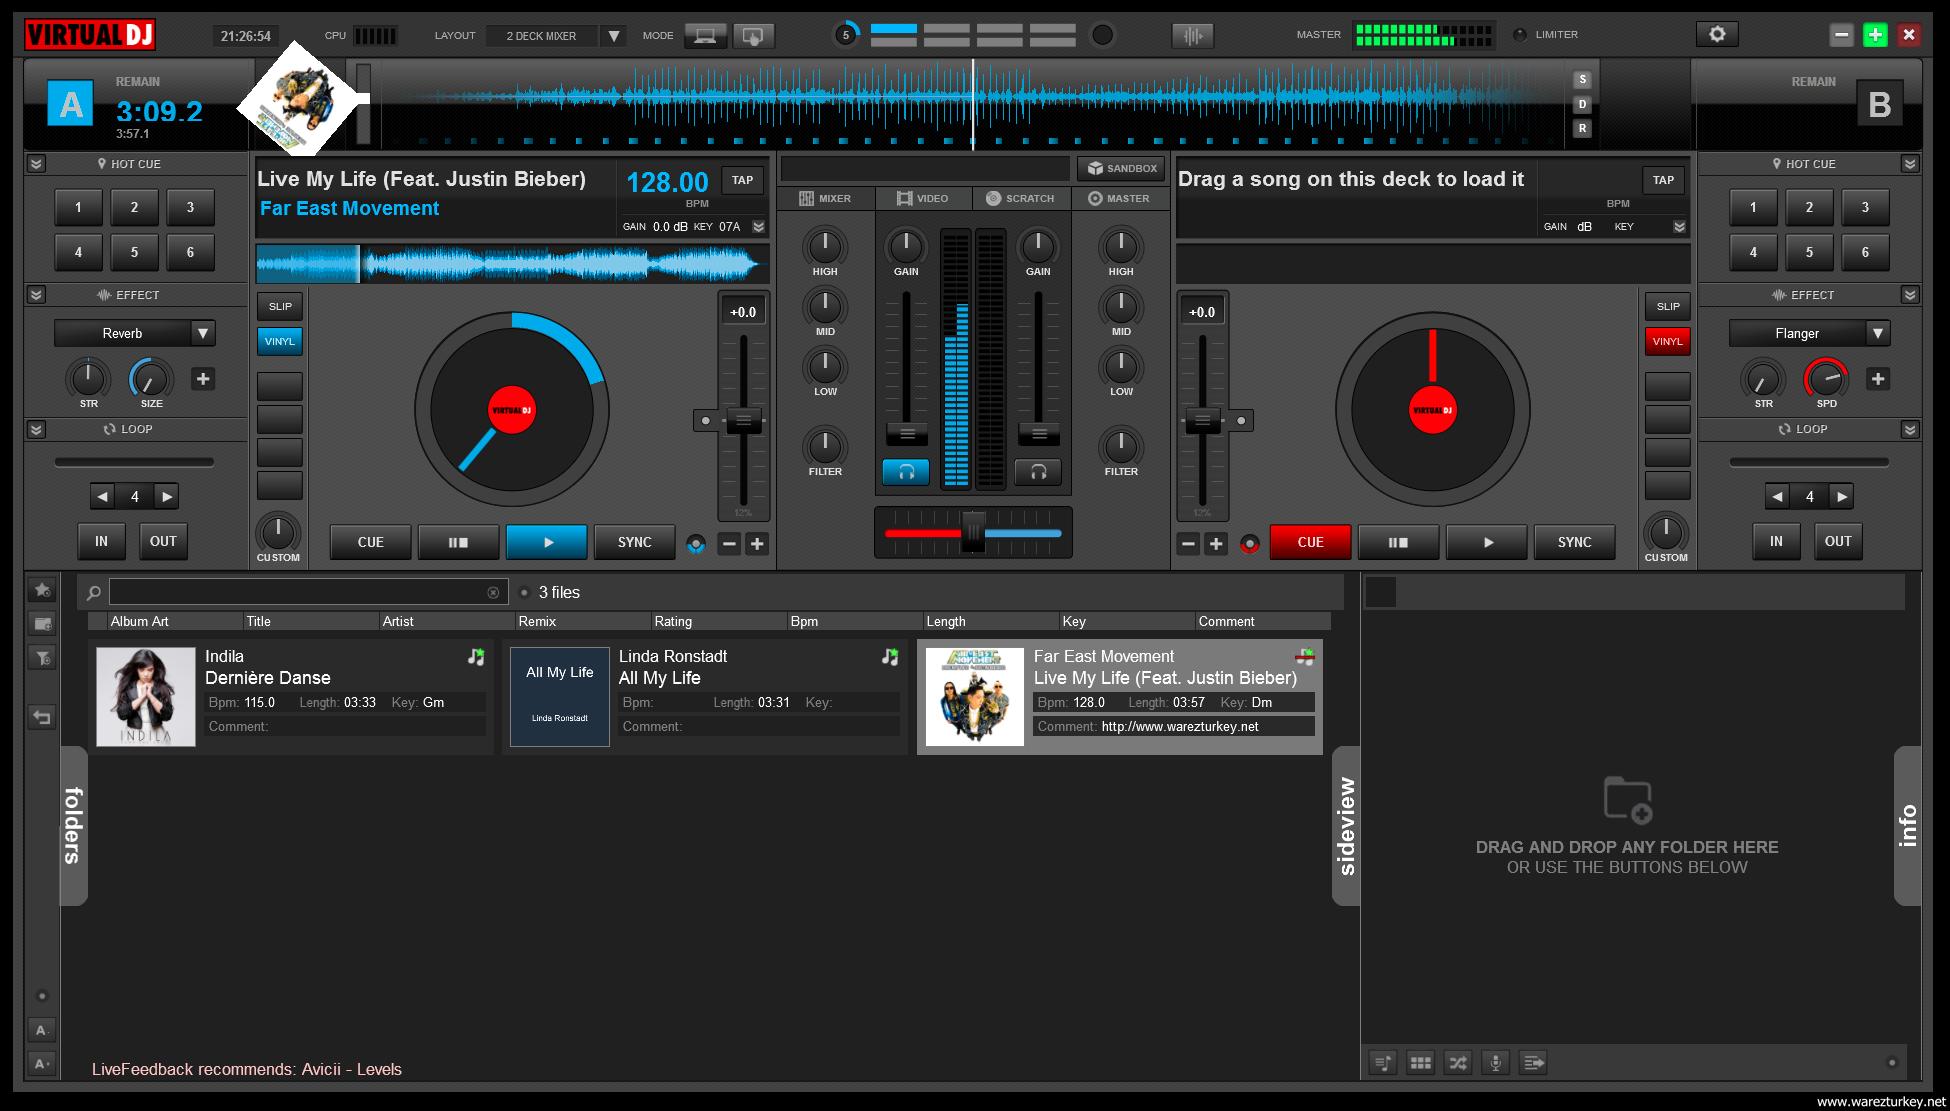 virtual dj crack macbook